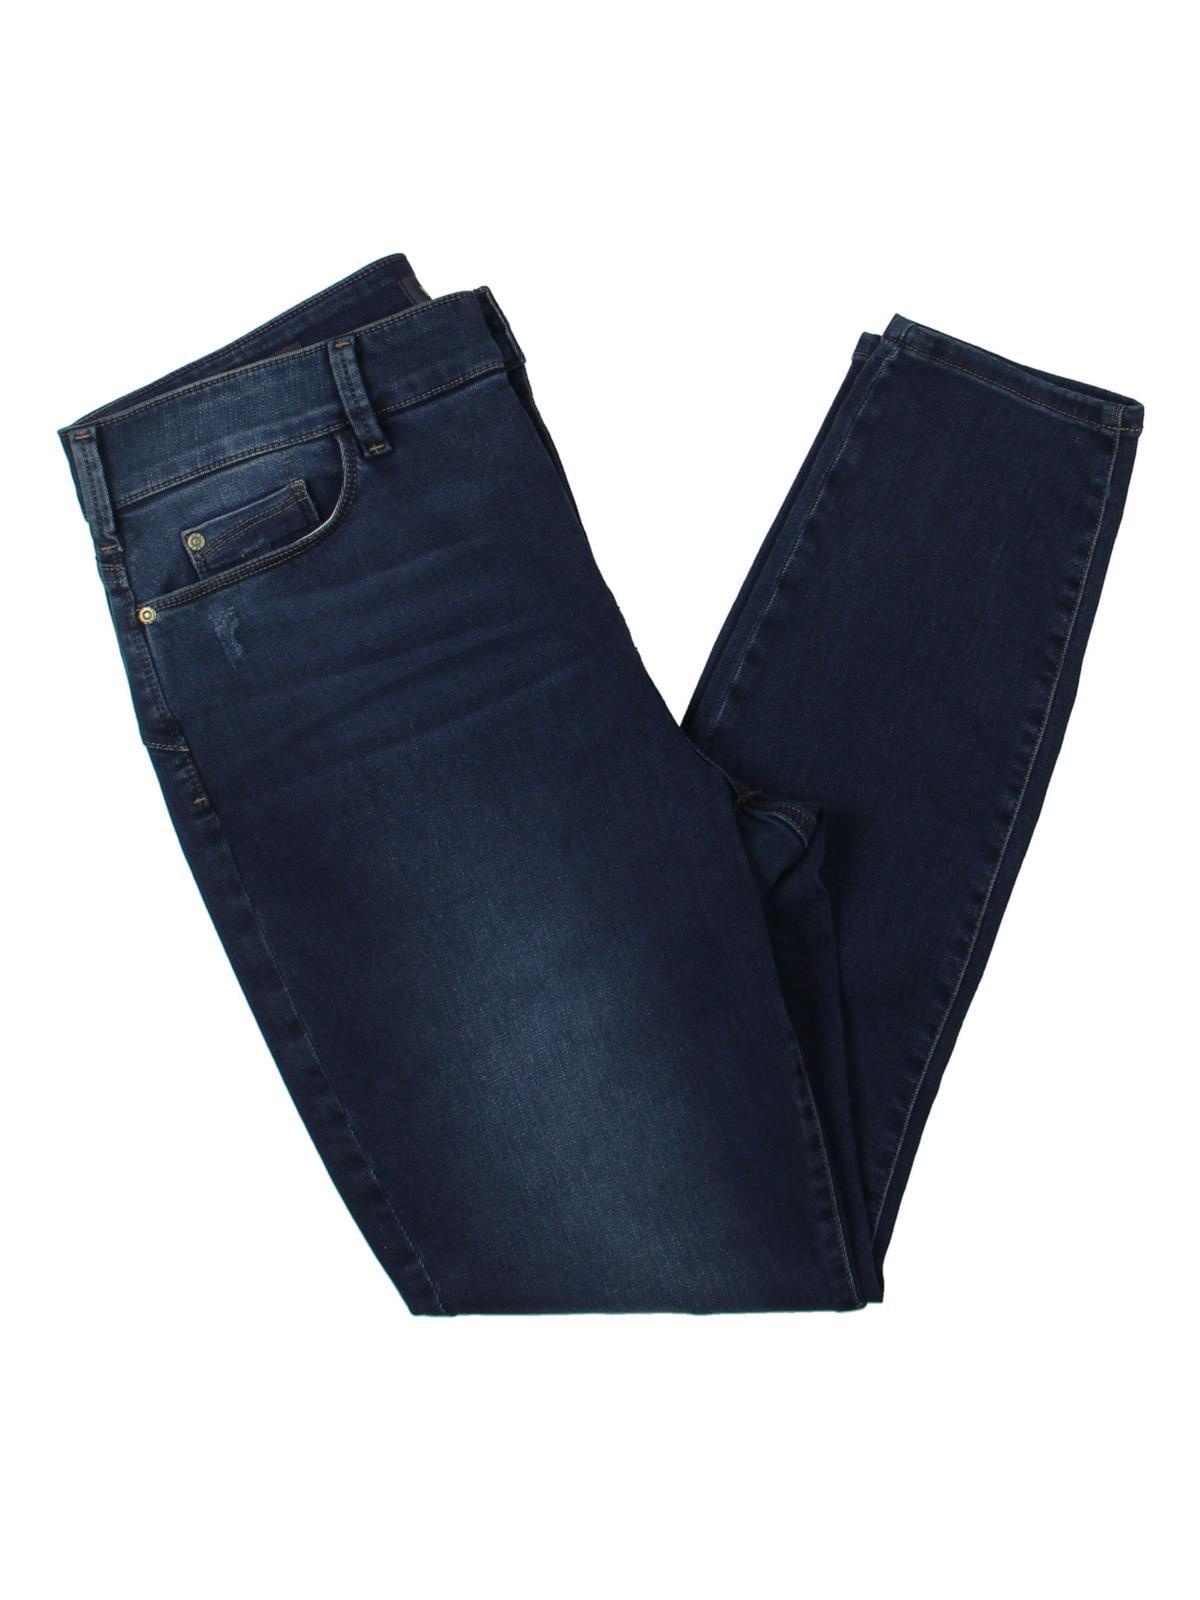 NYDJ Womens Petites Ami Mid-Rise Jegging Skinny Jeans